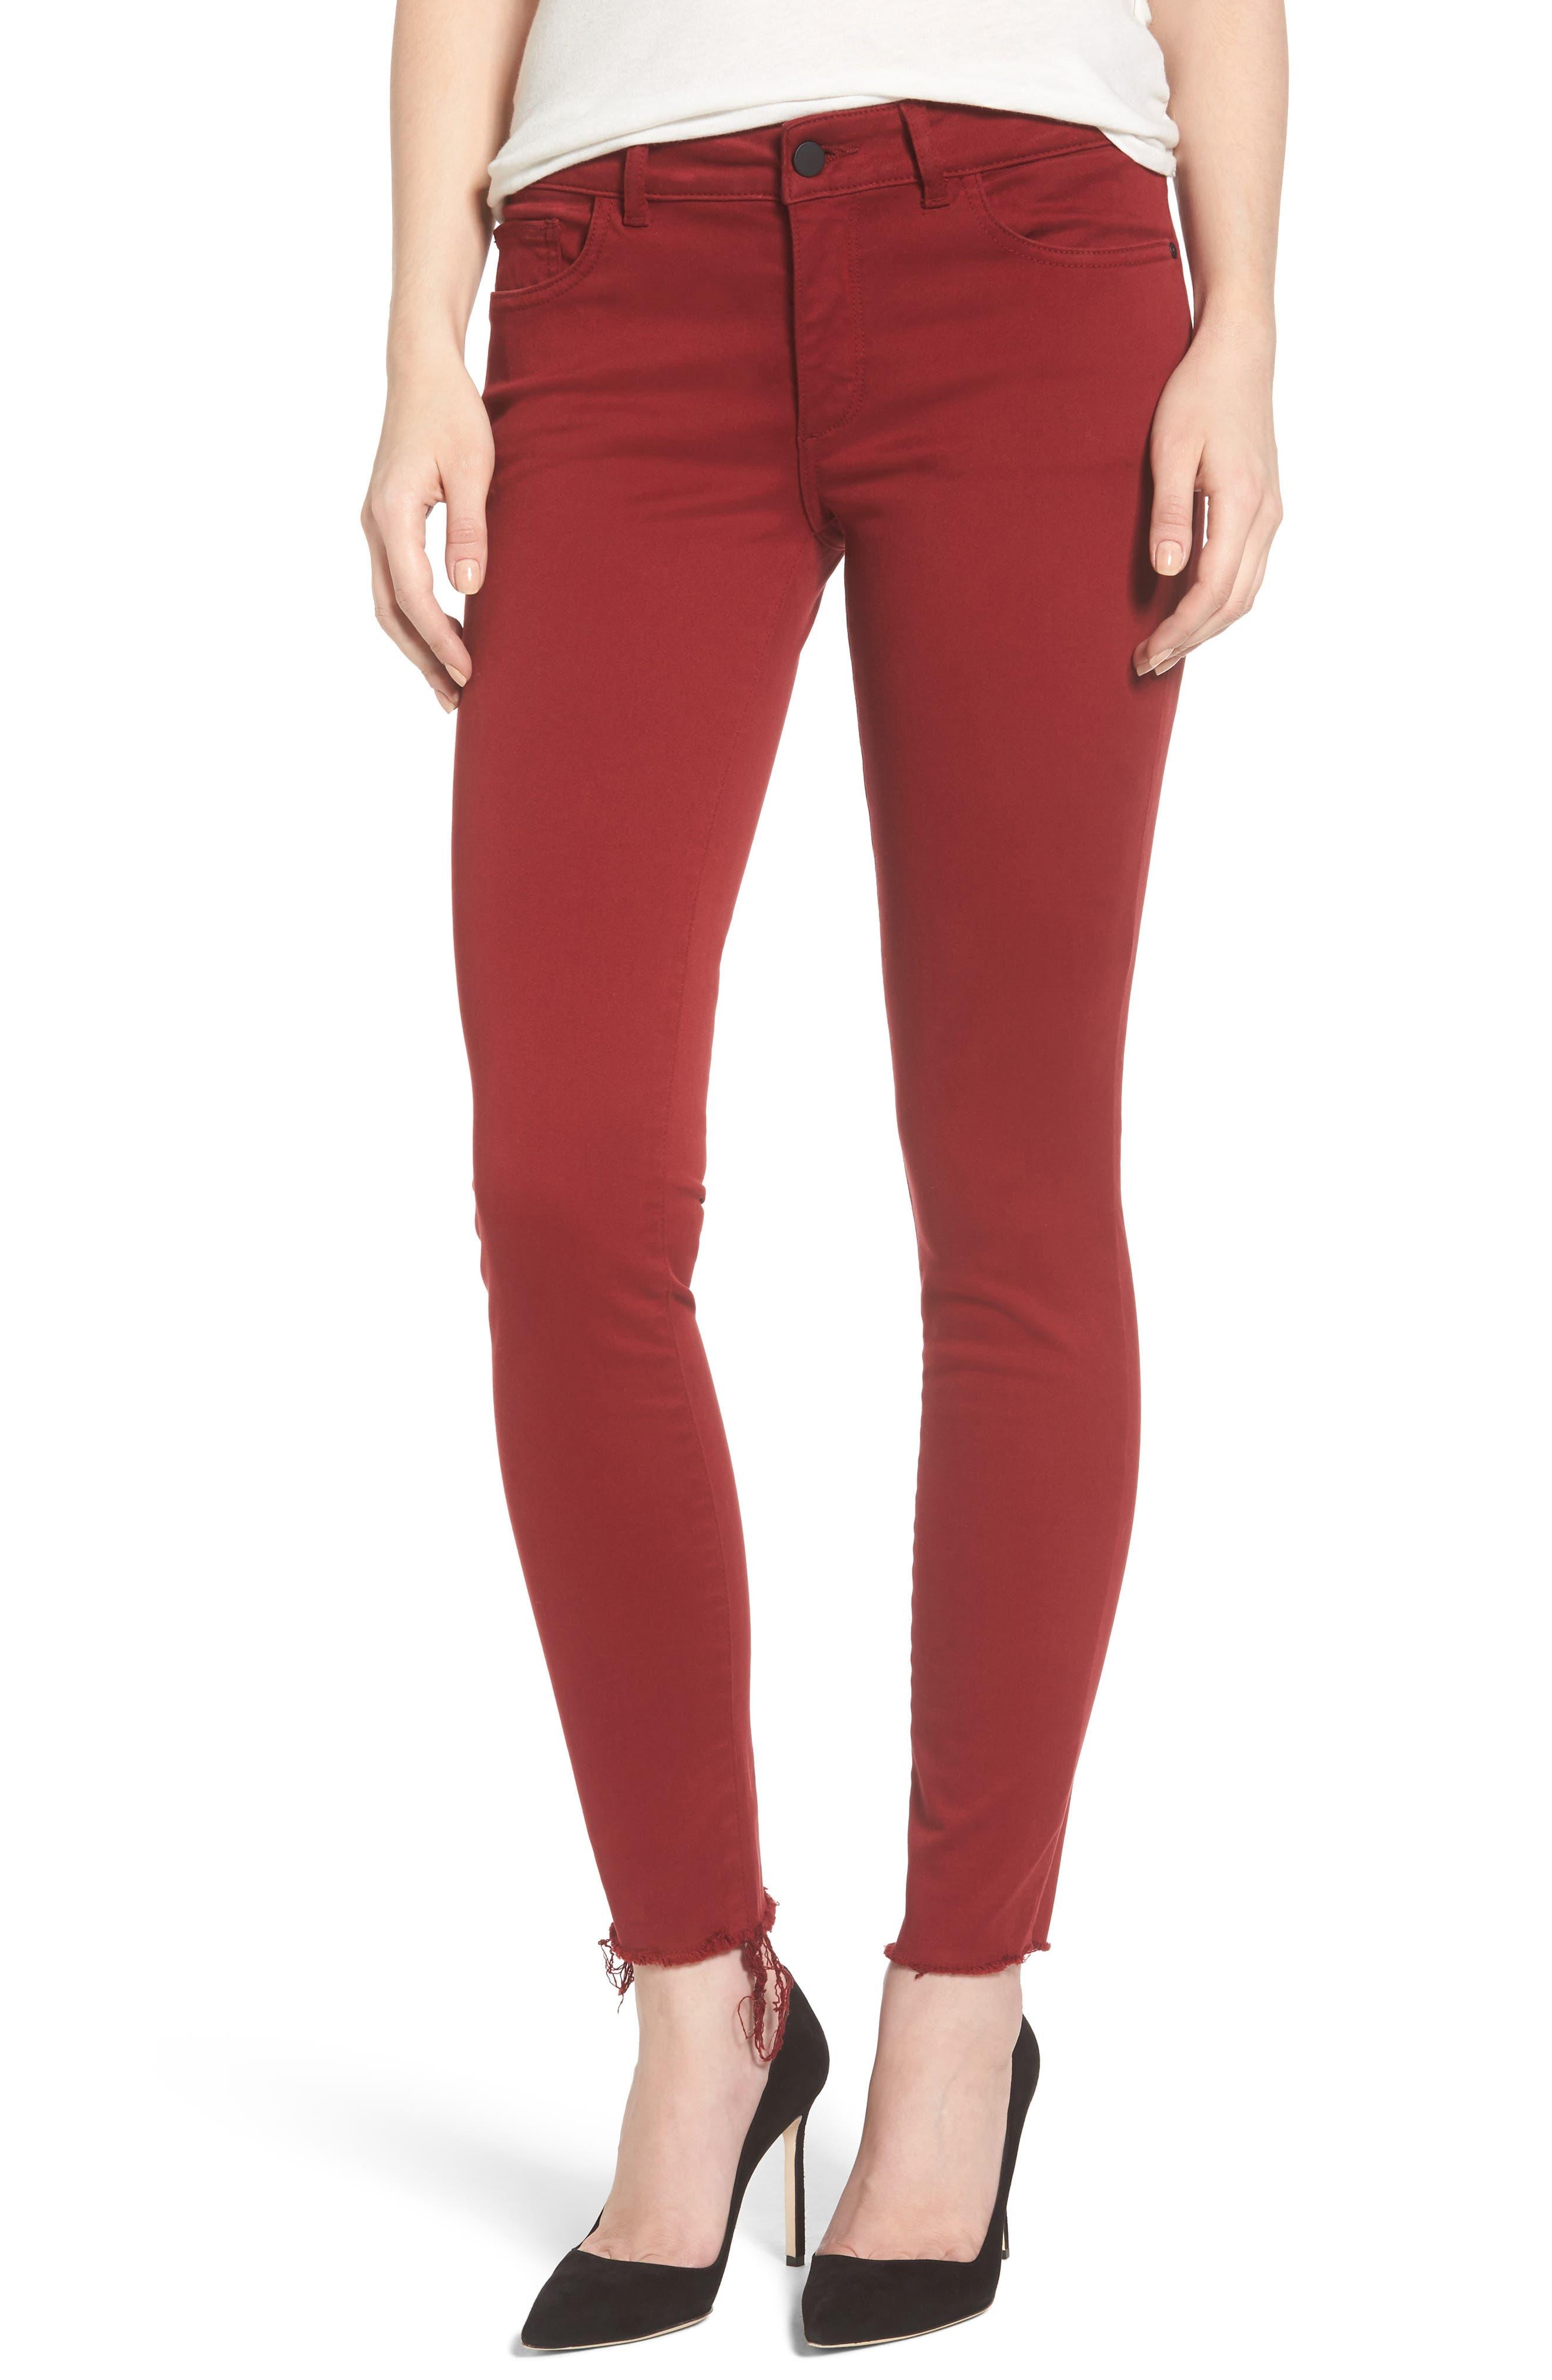 Emma Power Legging Jeans,                             Main thumbnail 1, color,                             Rhubarb